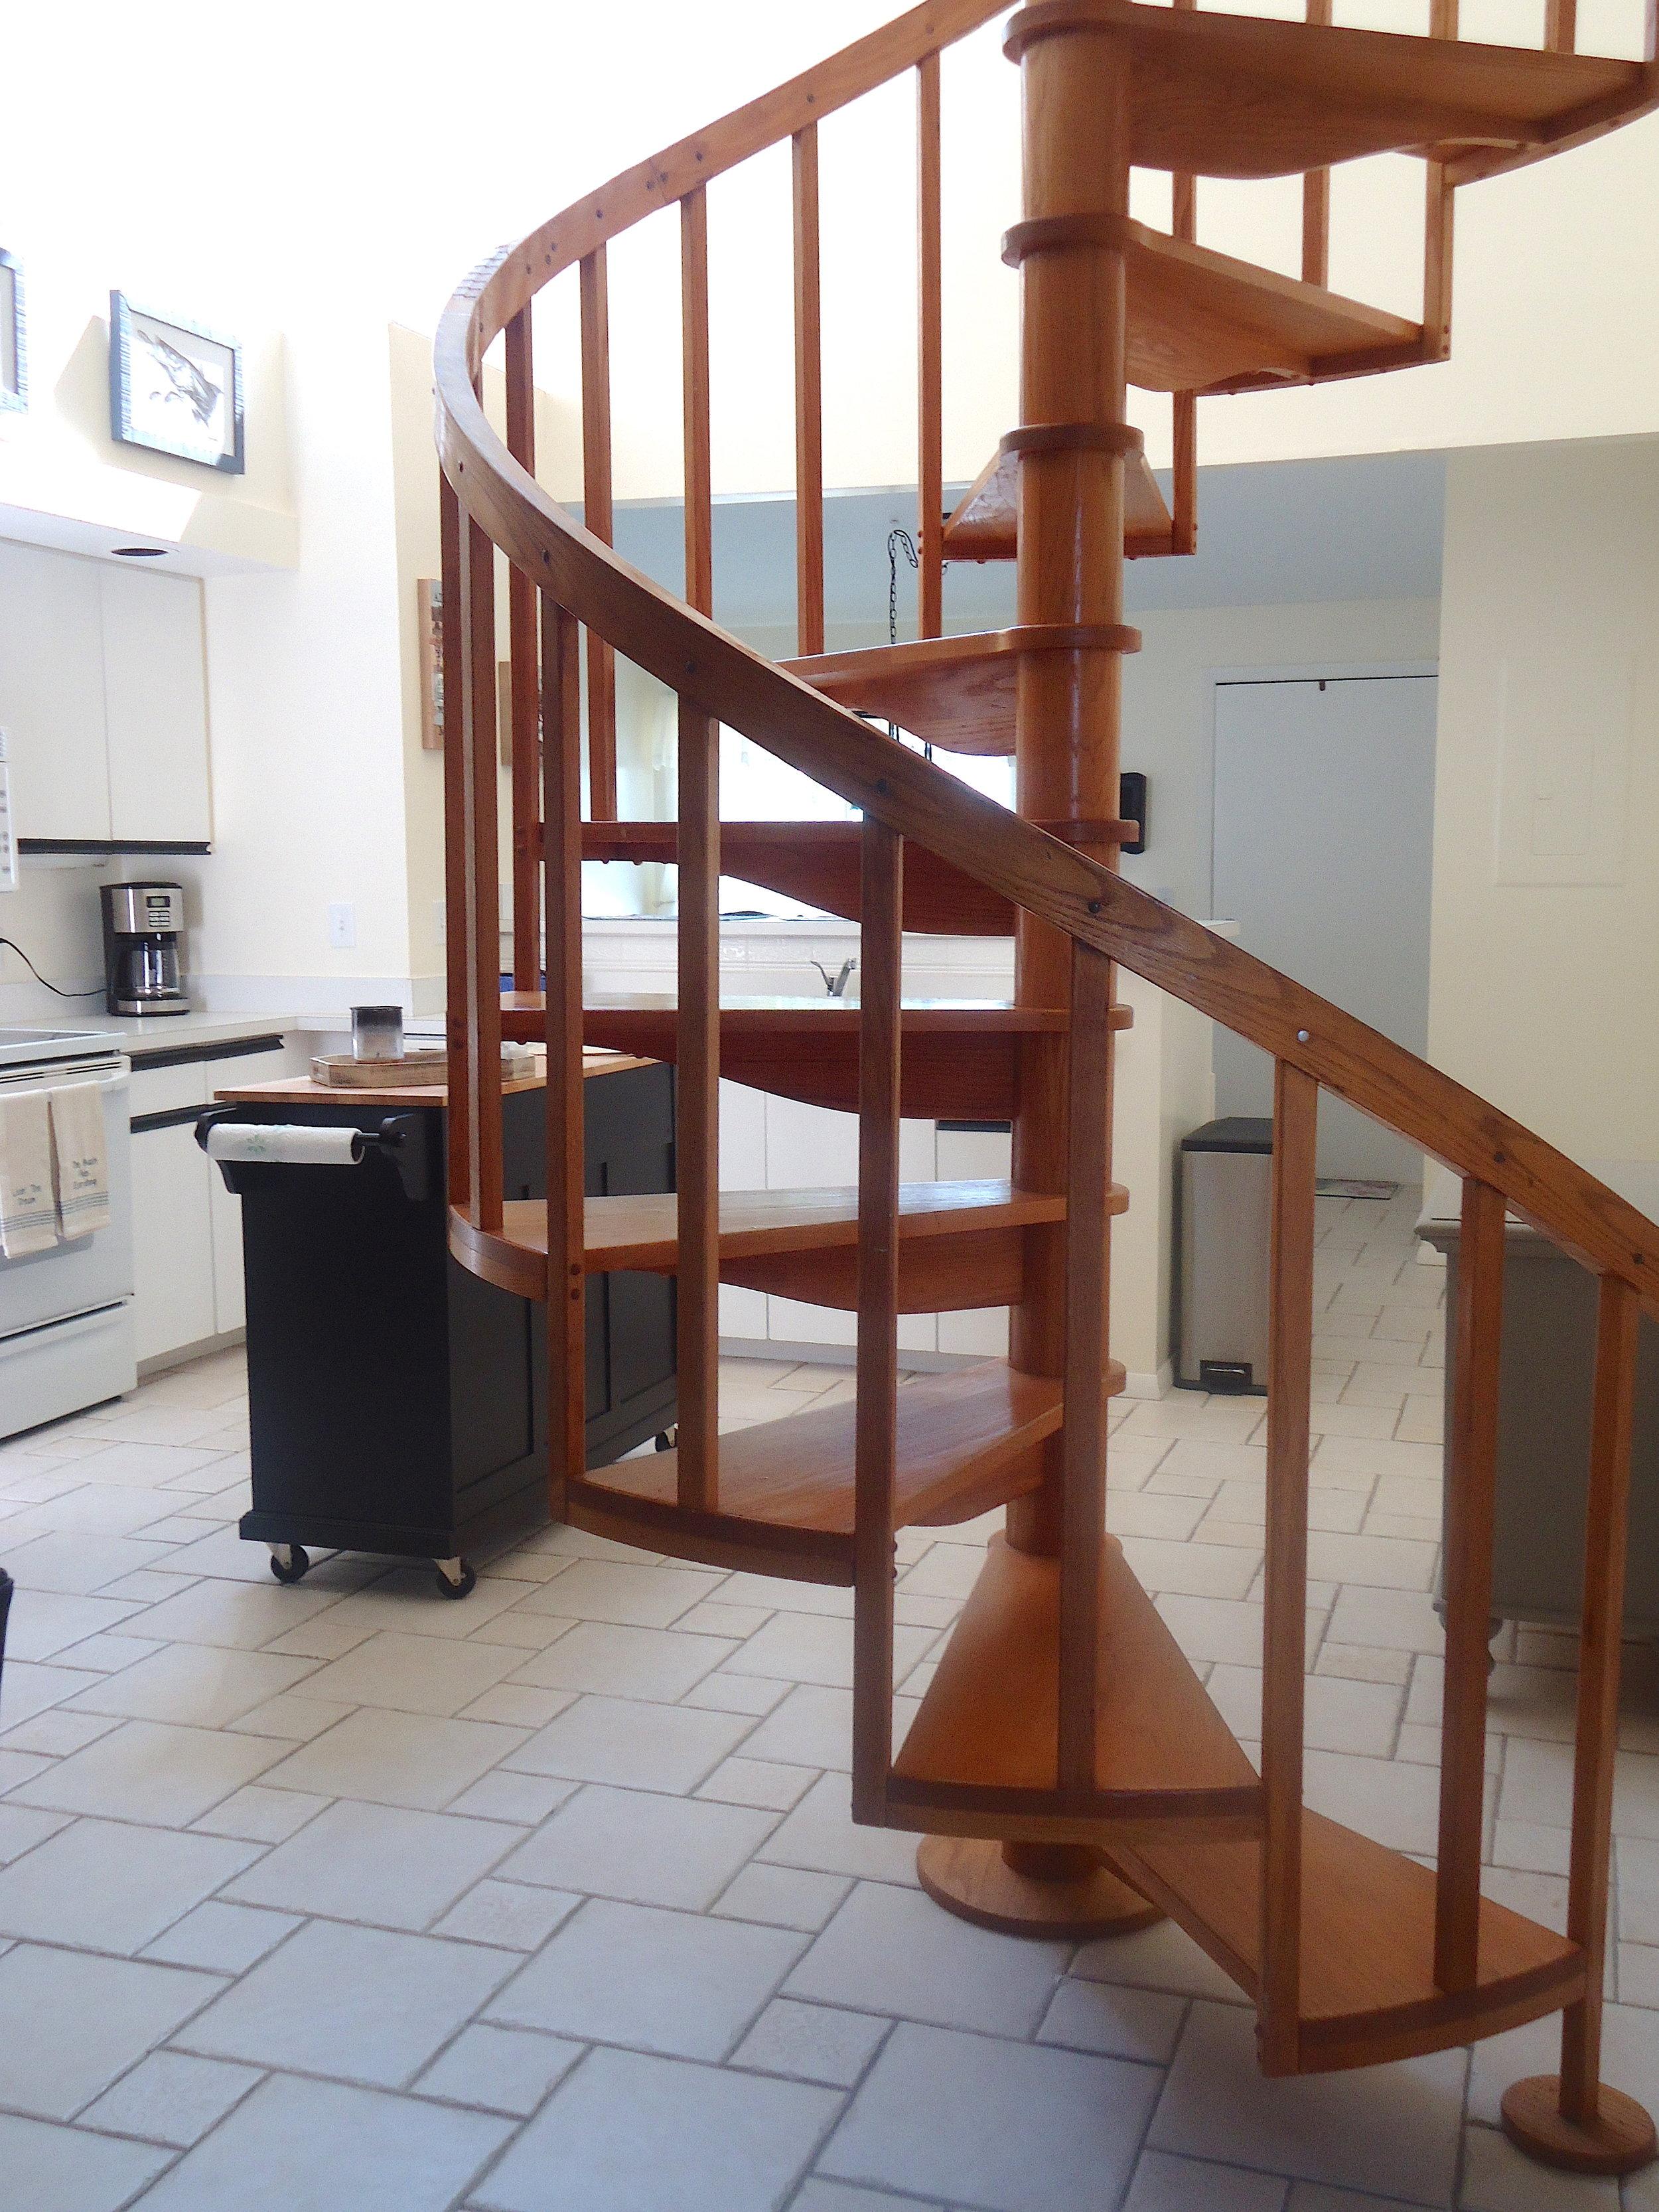 PB 305 spiral staircase.jpg